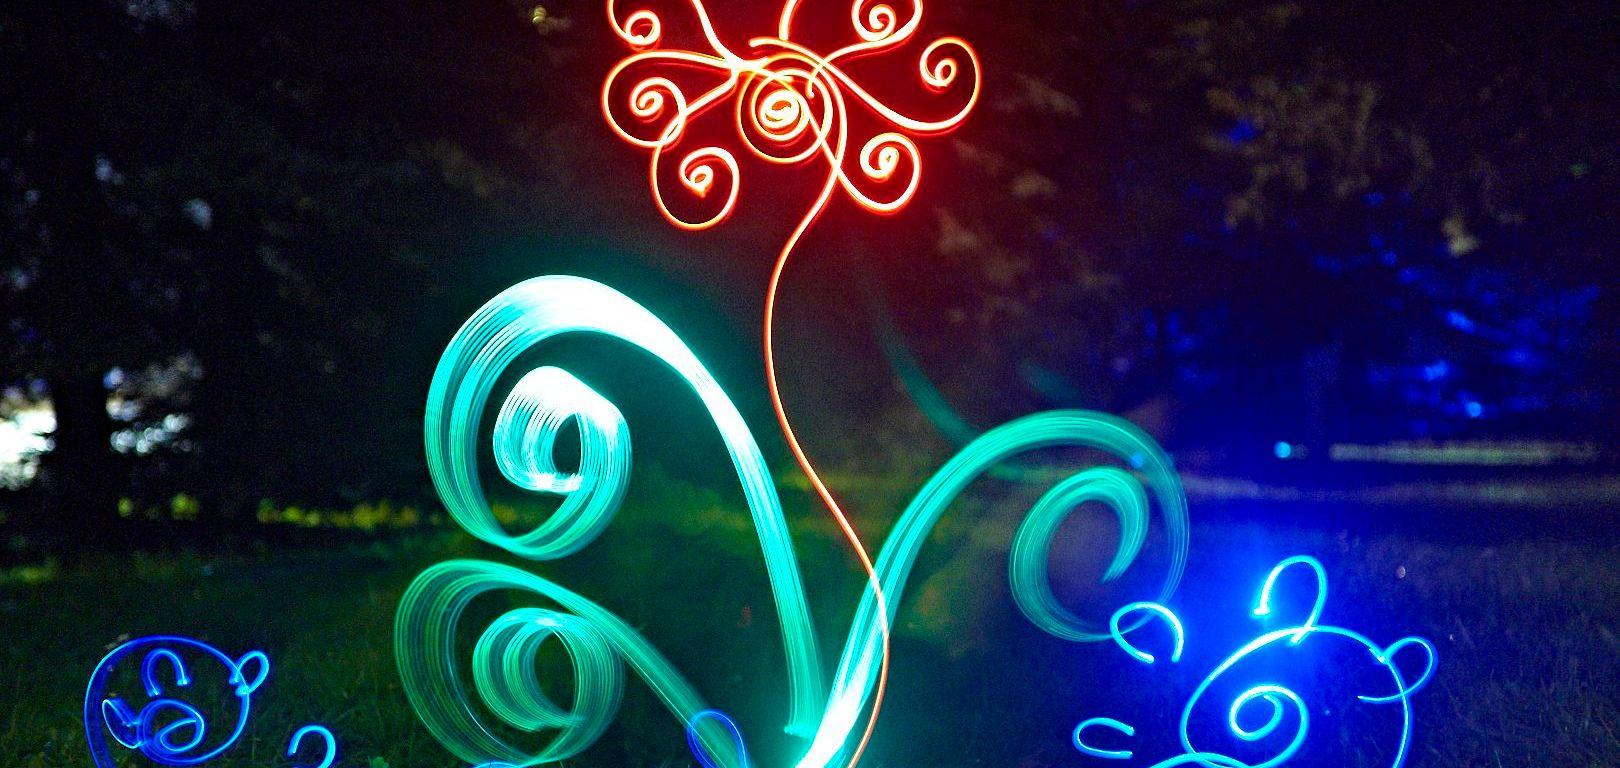 Lightpainting animation dream